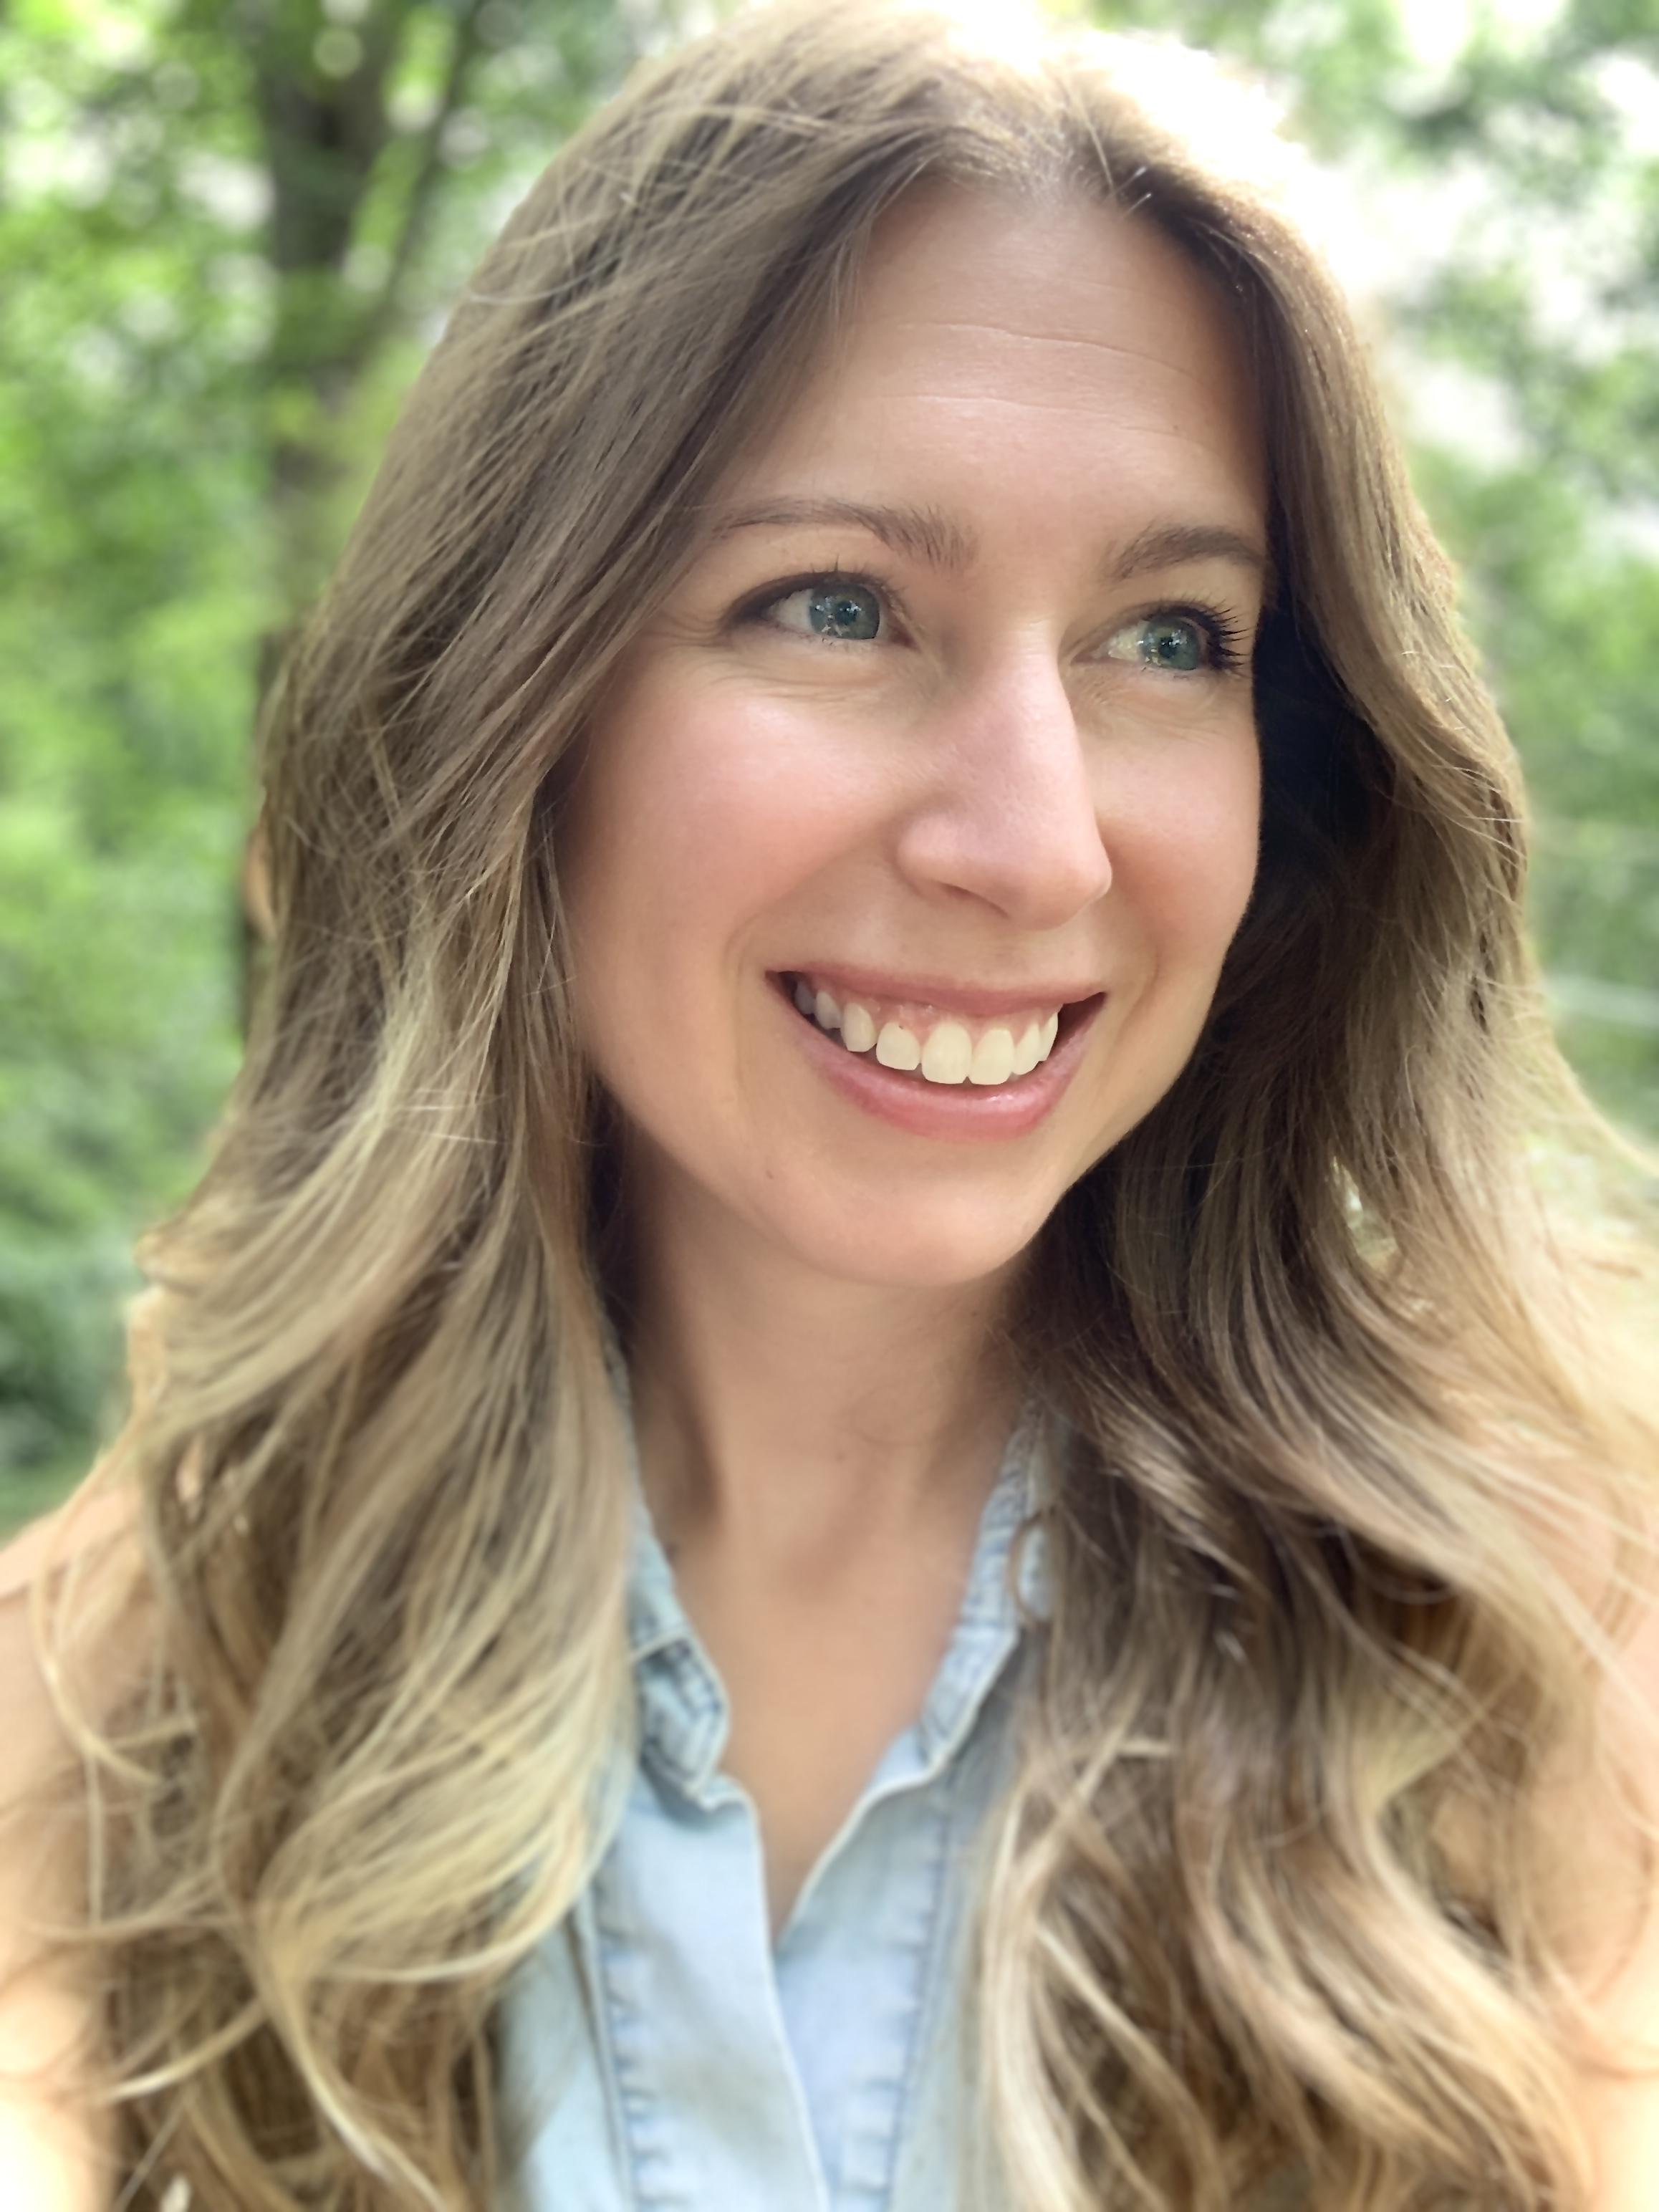 A portrait of Laura Bosco.